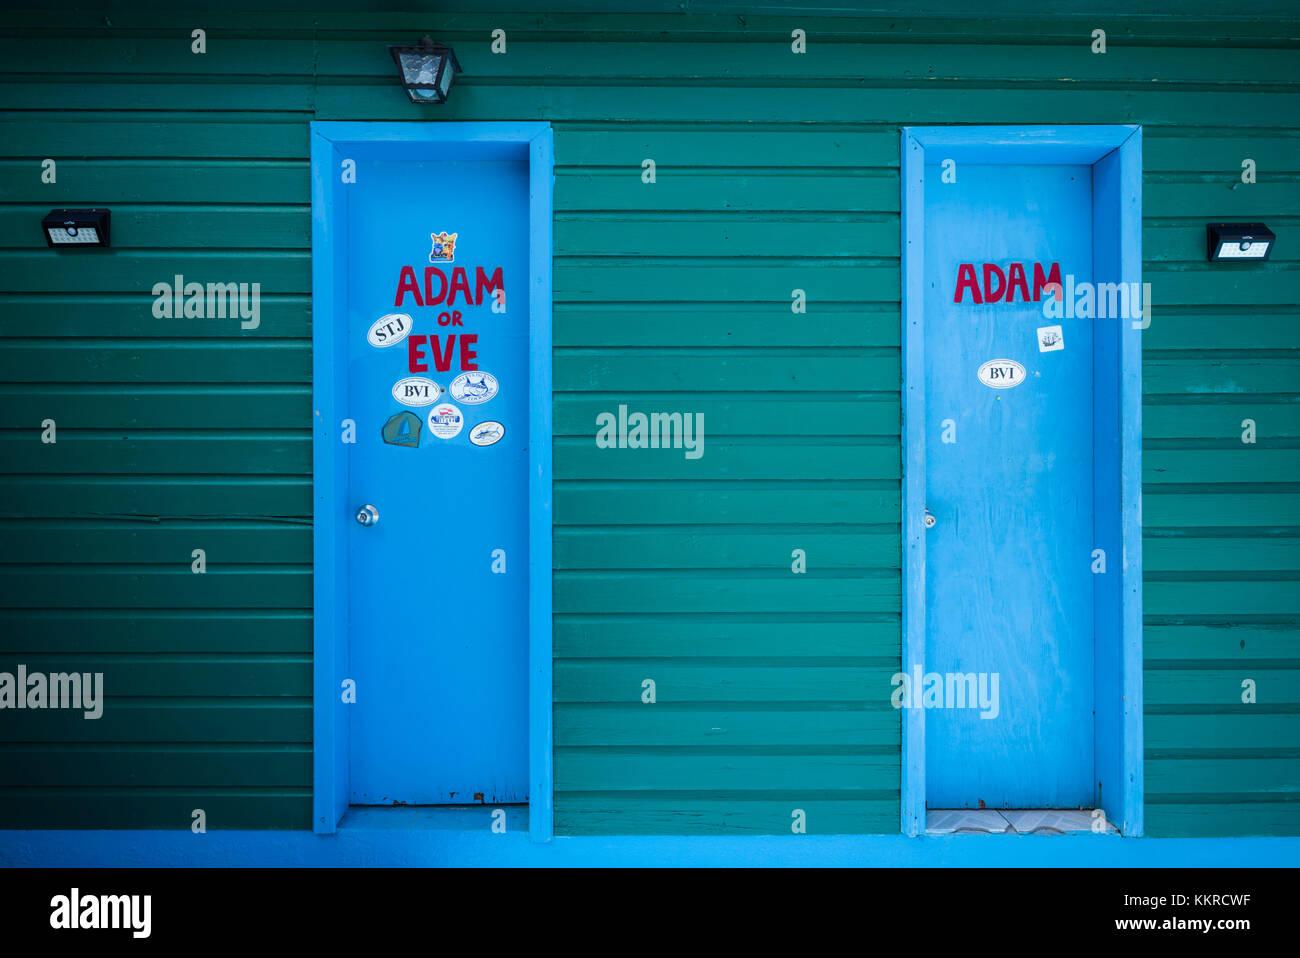 British Virgin Islands, Anegada, Loblolly Bay Beach, Big Bamboo Restuarant and Bar, restrooms - Stock Image